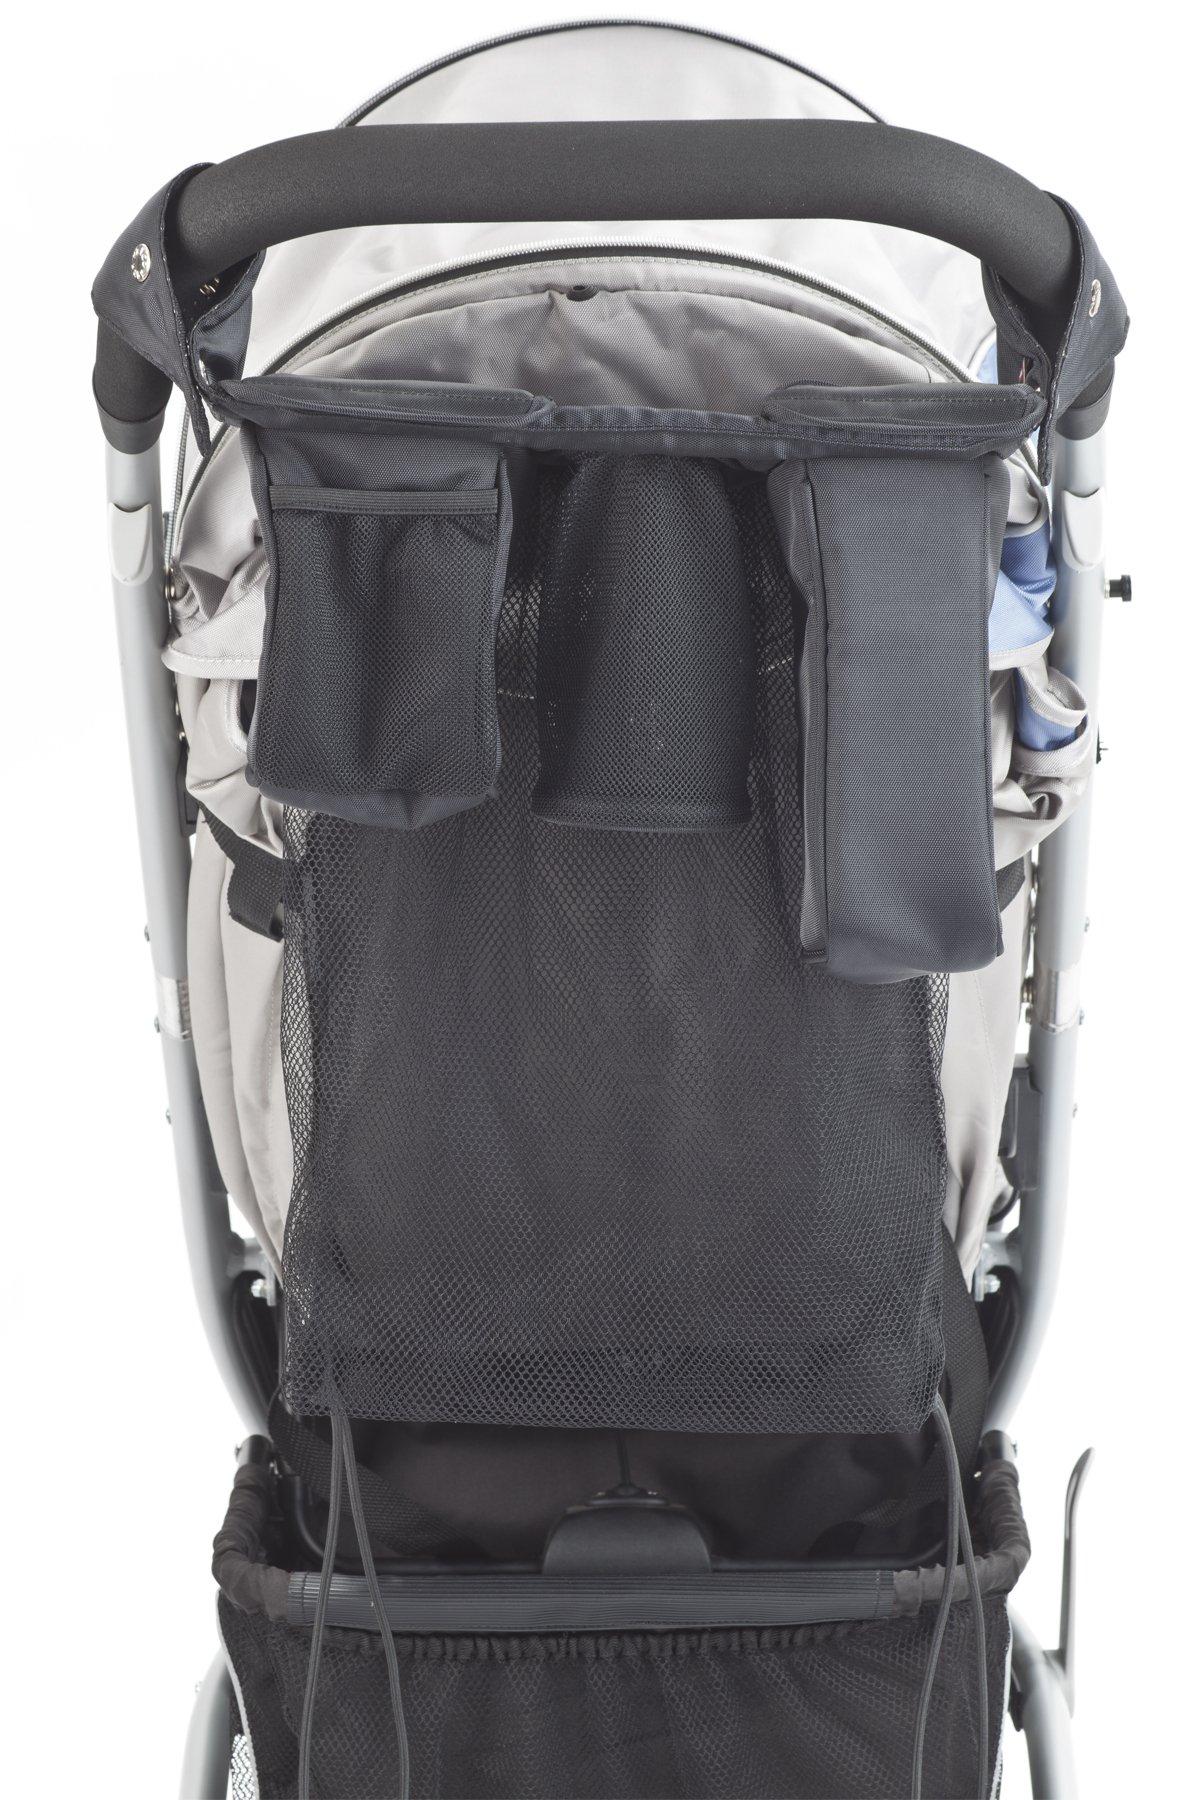 Valco Baby Stroller Caddy Organizer, Black, Universal by valco baby (Image #4)